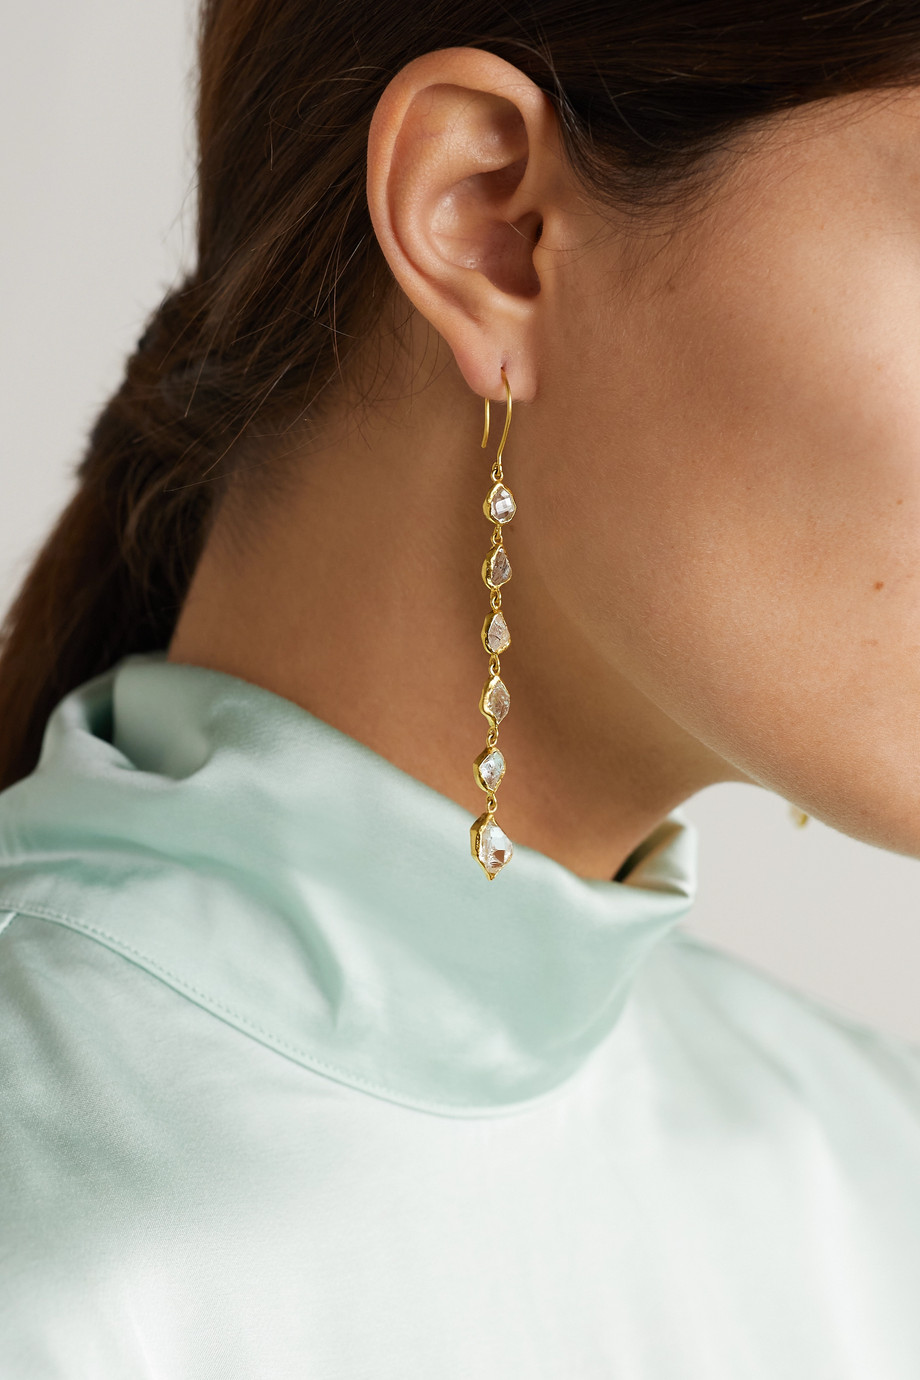 Pippa Small Crystallinity 18-karat gold Herkimer diamond earrings